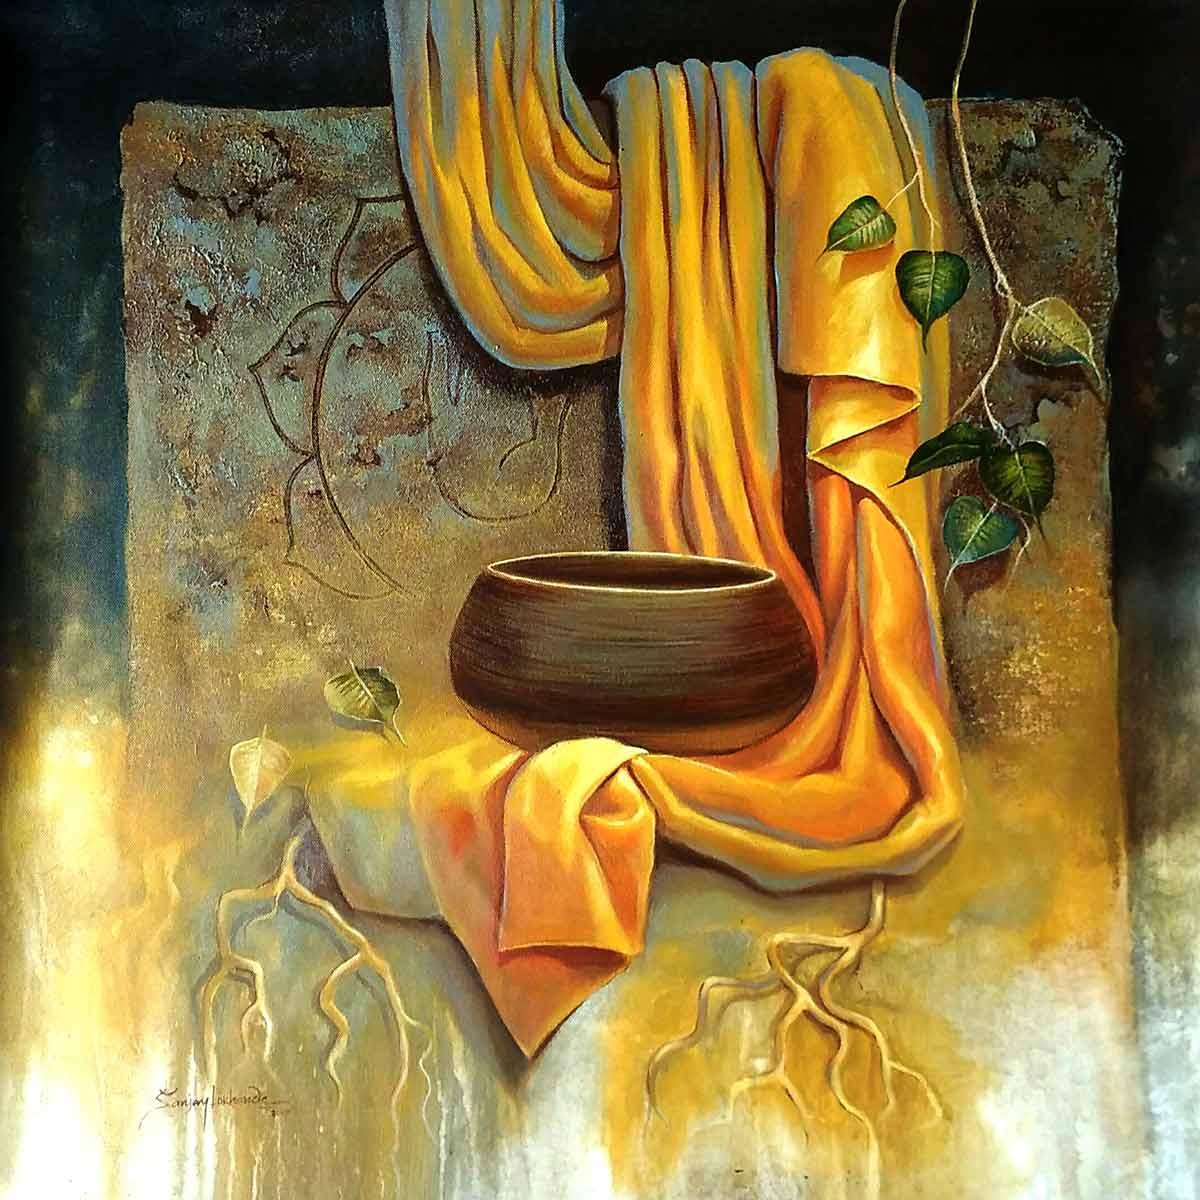 Buy Buddha Painting With Acrylic On Canvas By Sanjay Lokhande Indigalleria